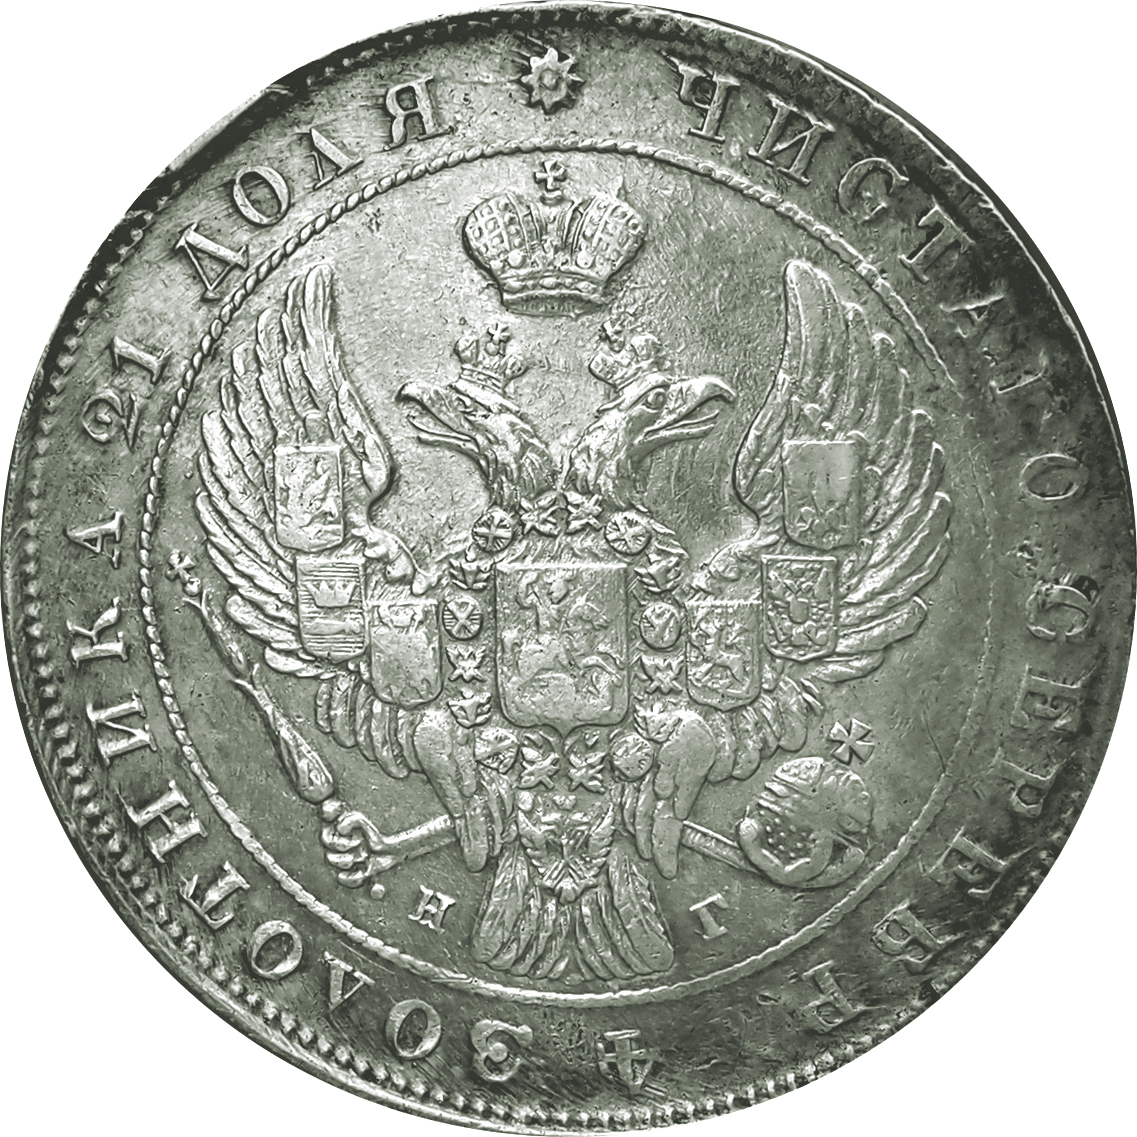 1 Rublo Nicolas I  Rusia 1840 9068137728_8d7d9572a8_o